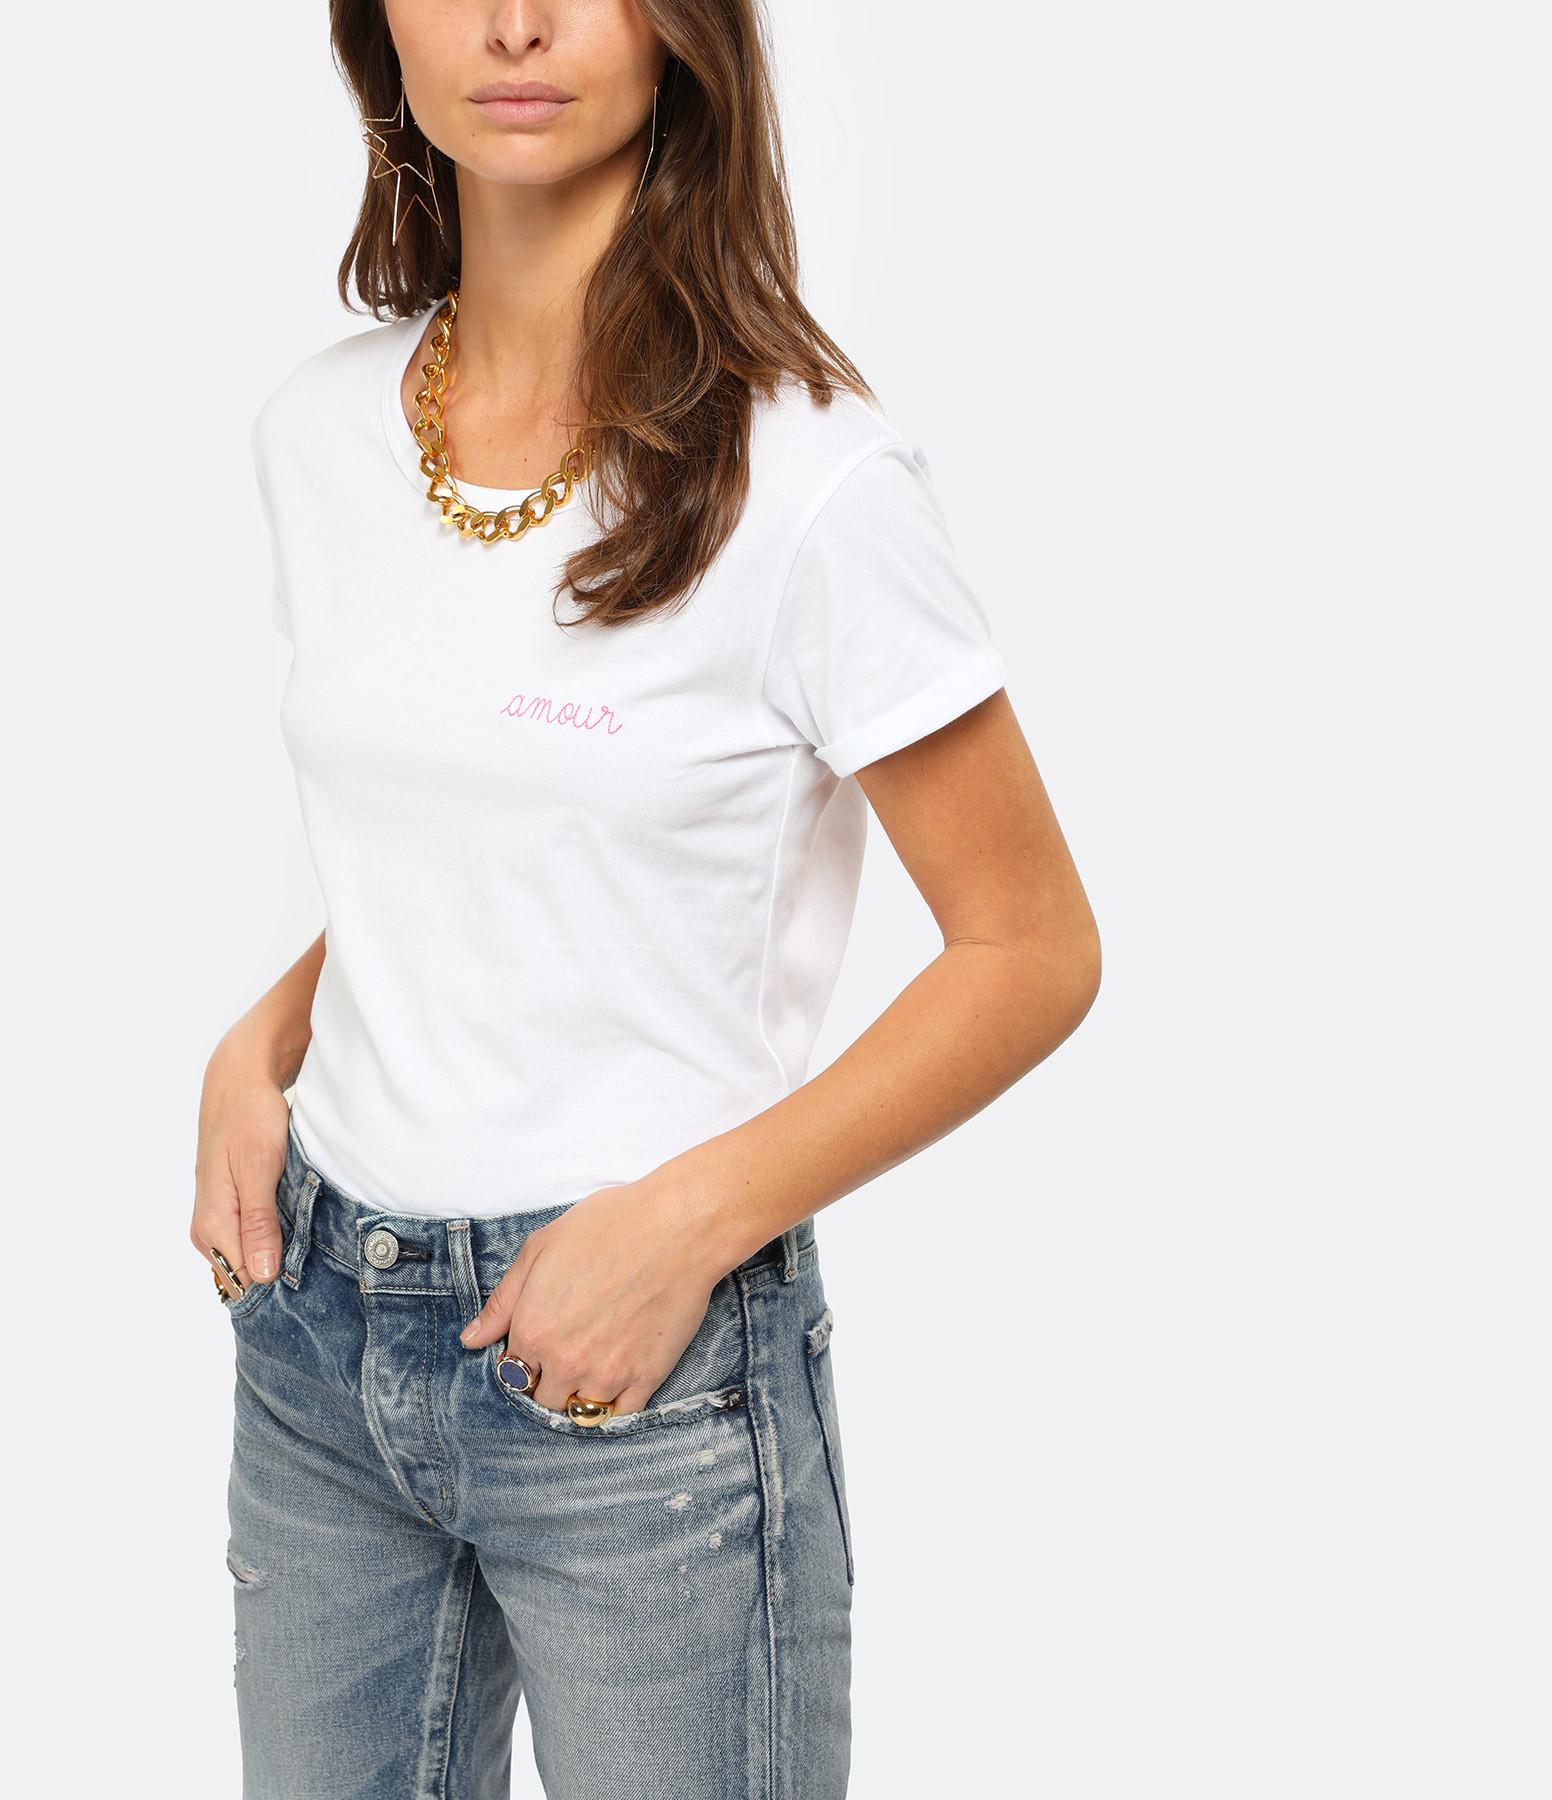 MAISON LABICHE - Tee-shirt Amour Blanc